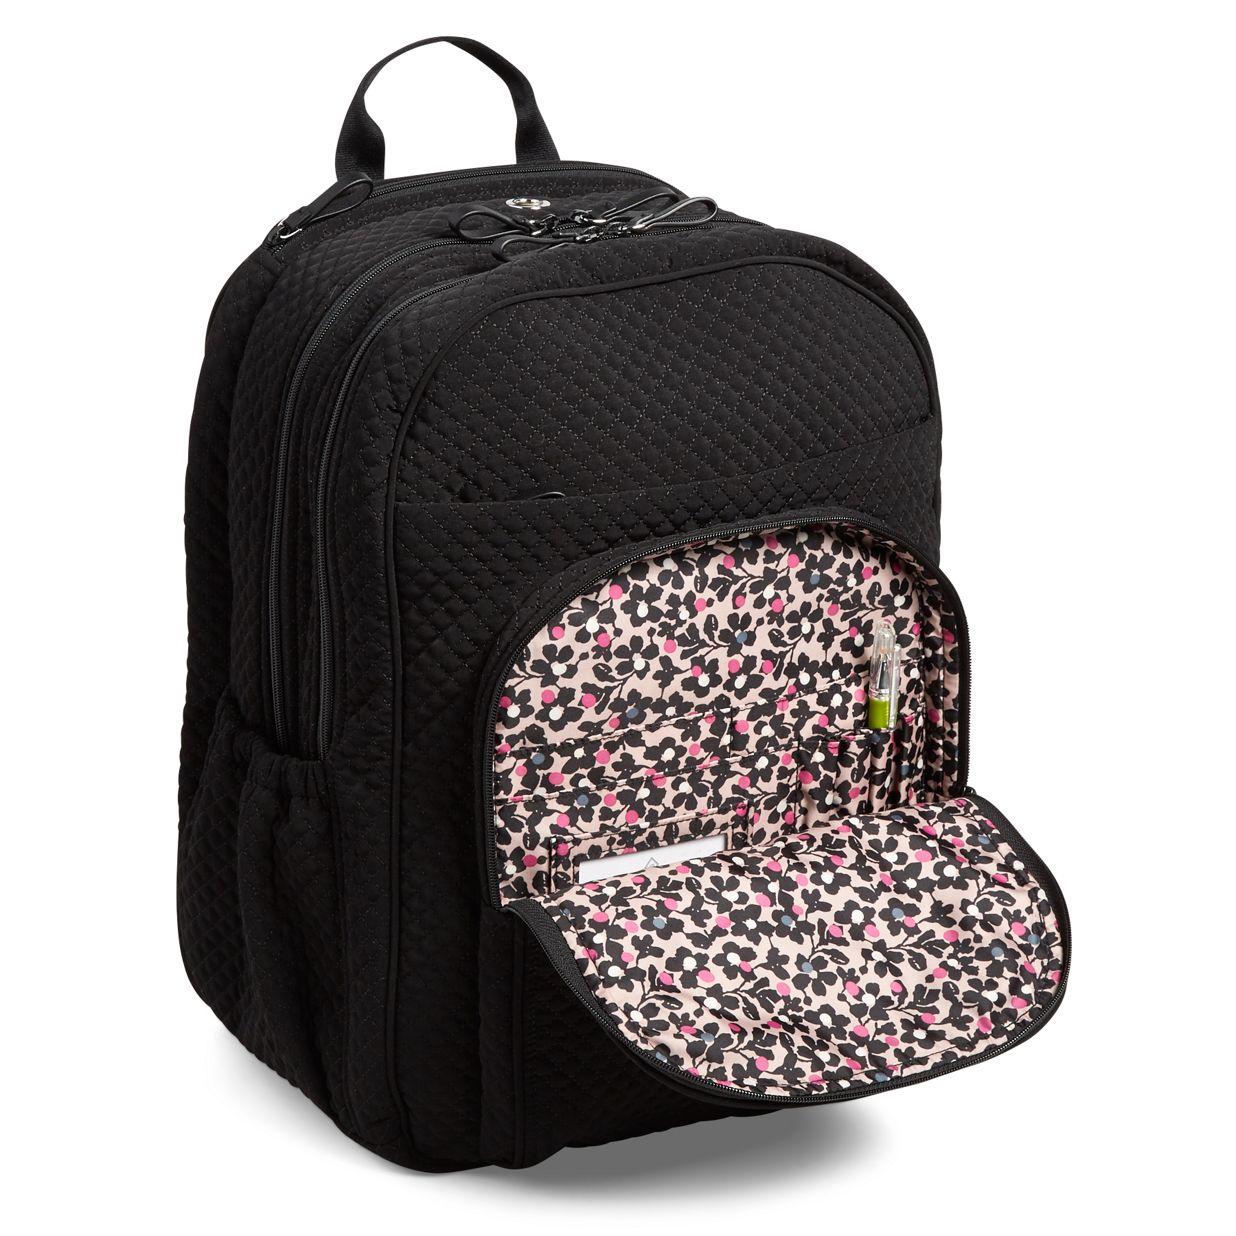 Iconic Xl Campus Backpack Vera Bradley